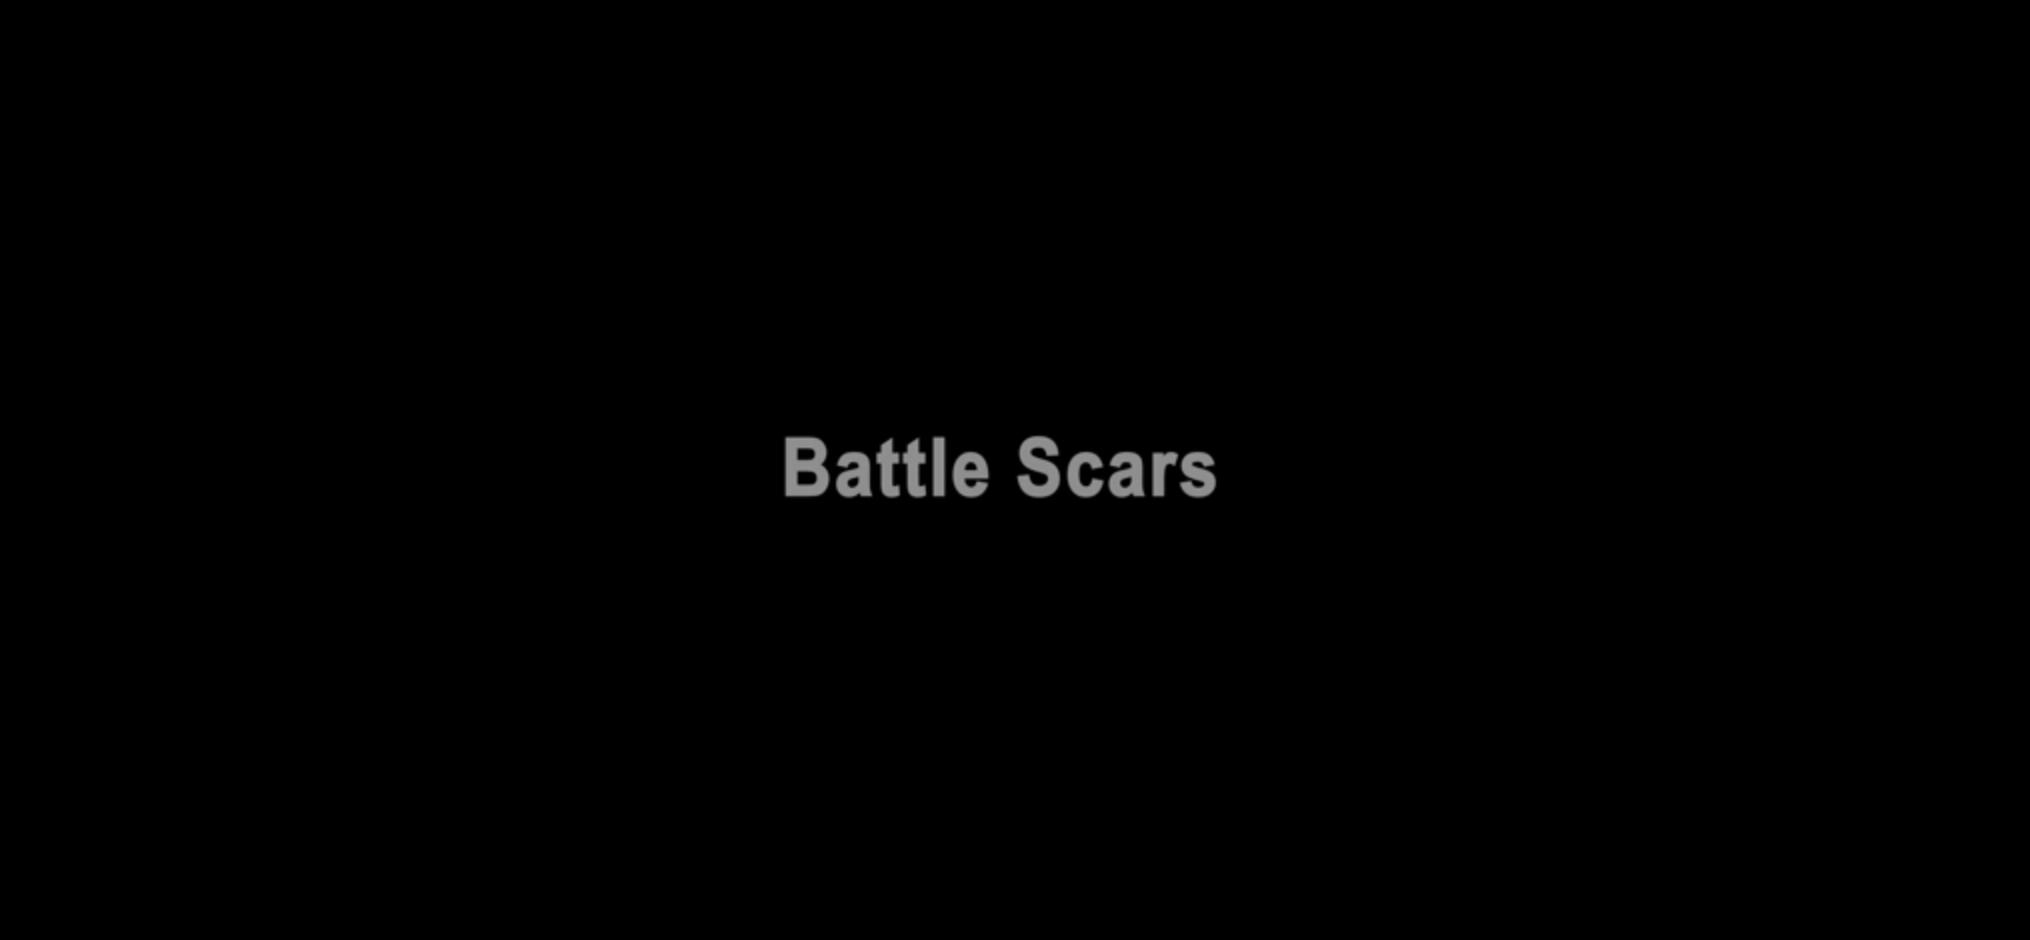 Star Wars: The Bad Batch Battle Scars title card